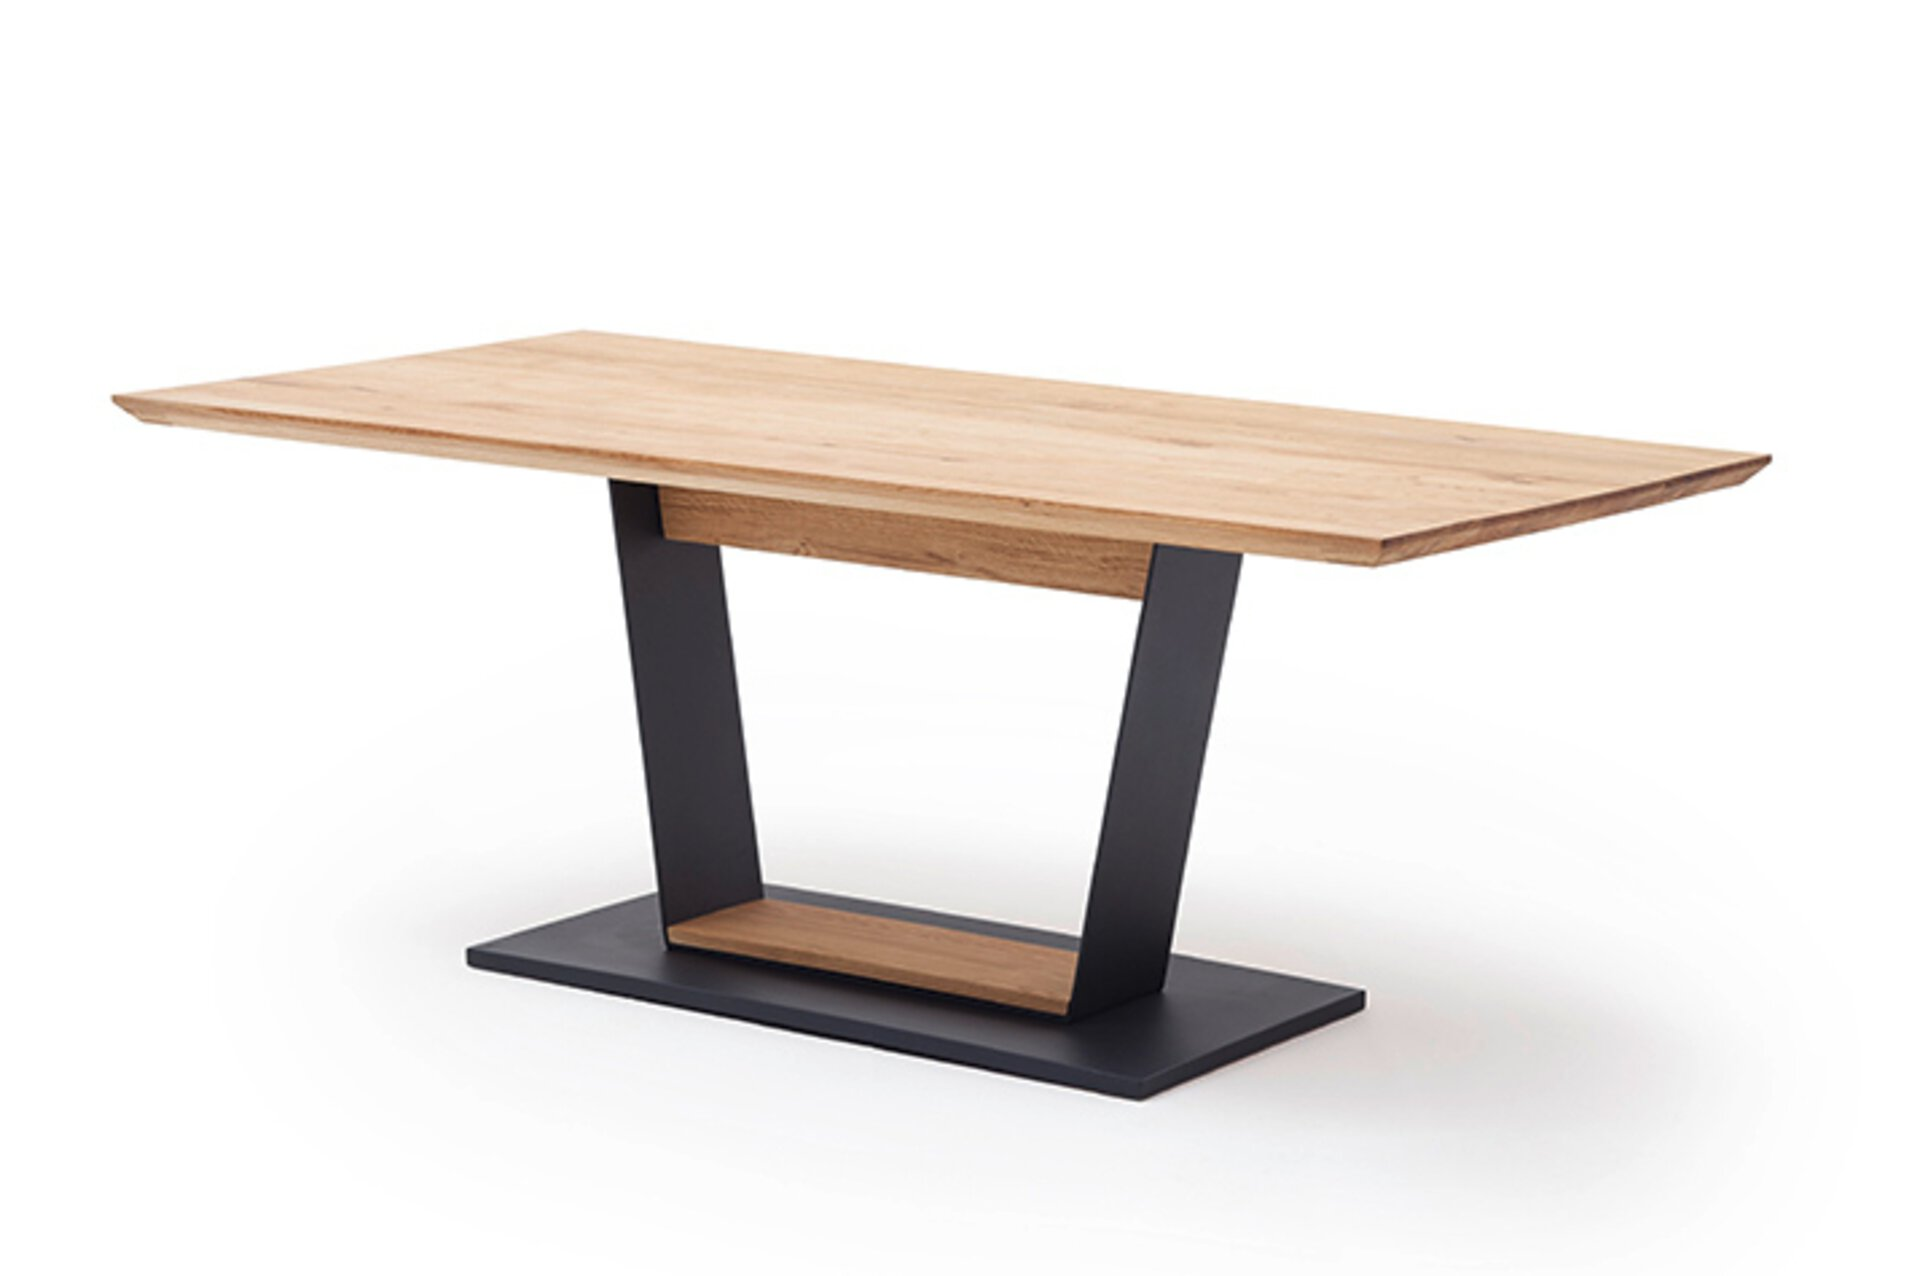 Esstisch MALAMBO MCA furniture Metall mehrfarbig 90 x 77 x 180 cm